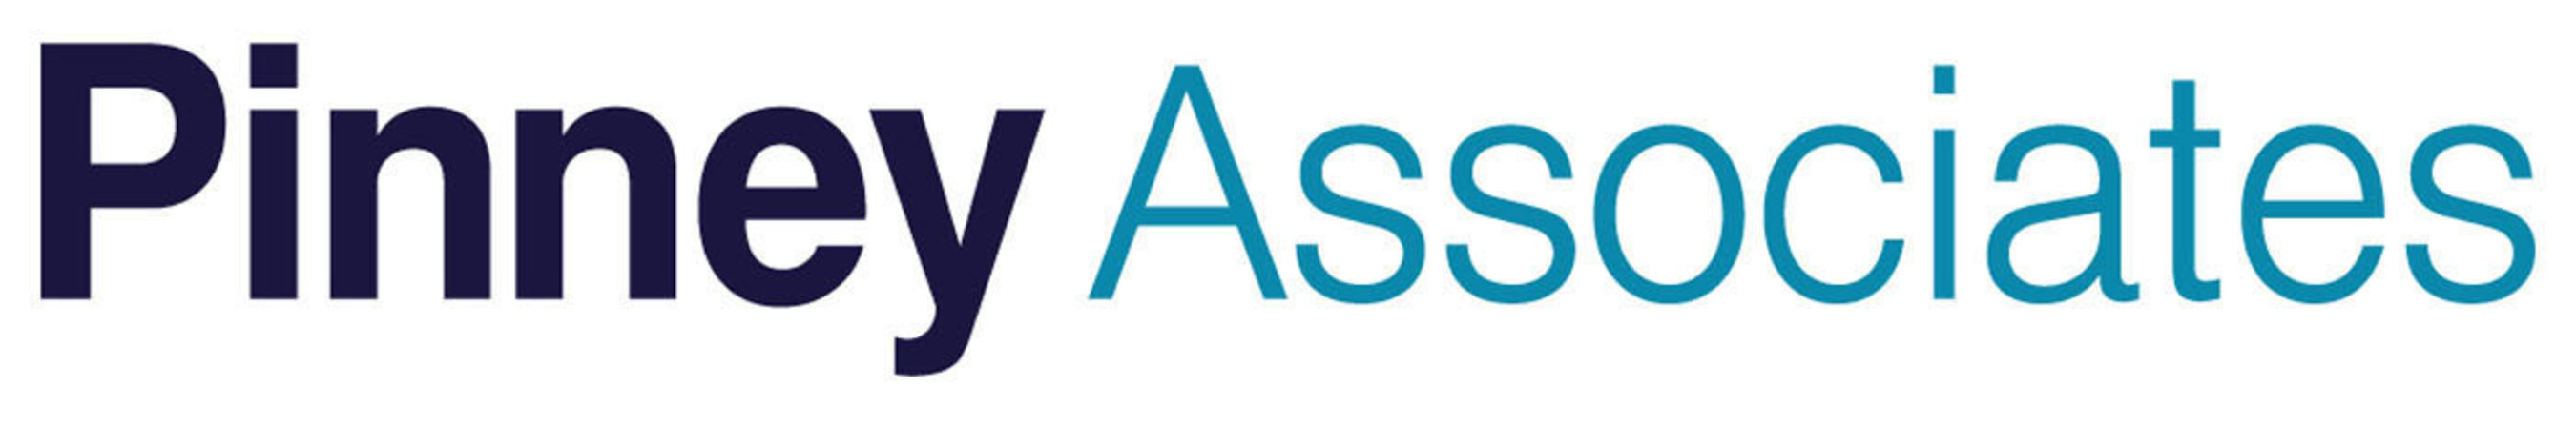 Pinney Associates logo.